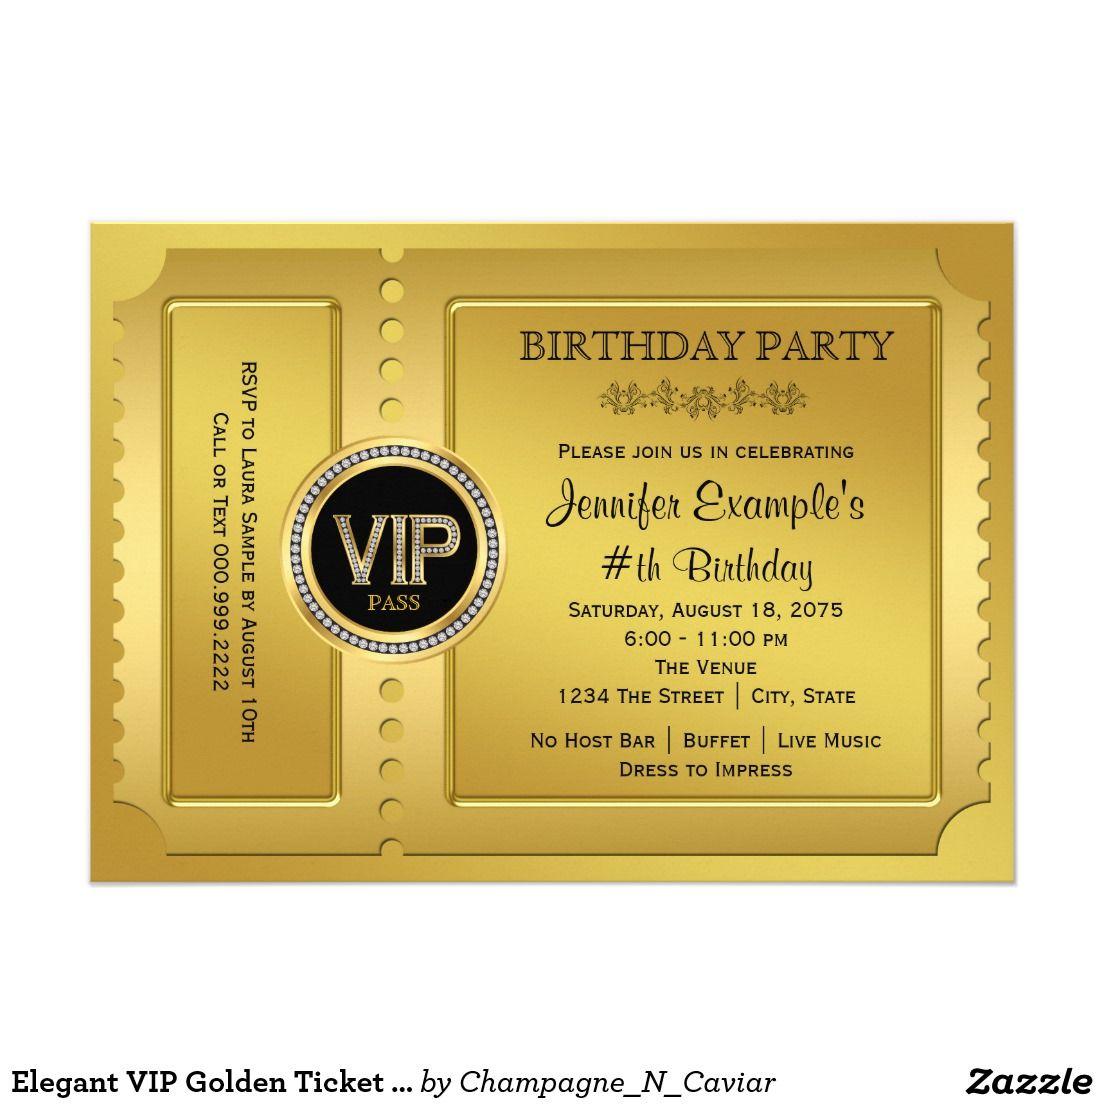 Elegant VIP Golden Ticket Birthday Party Card – Golden Ticket Party Invitations